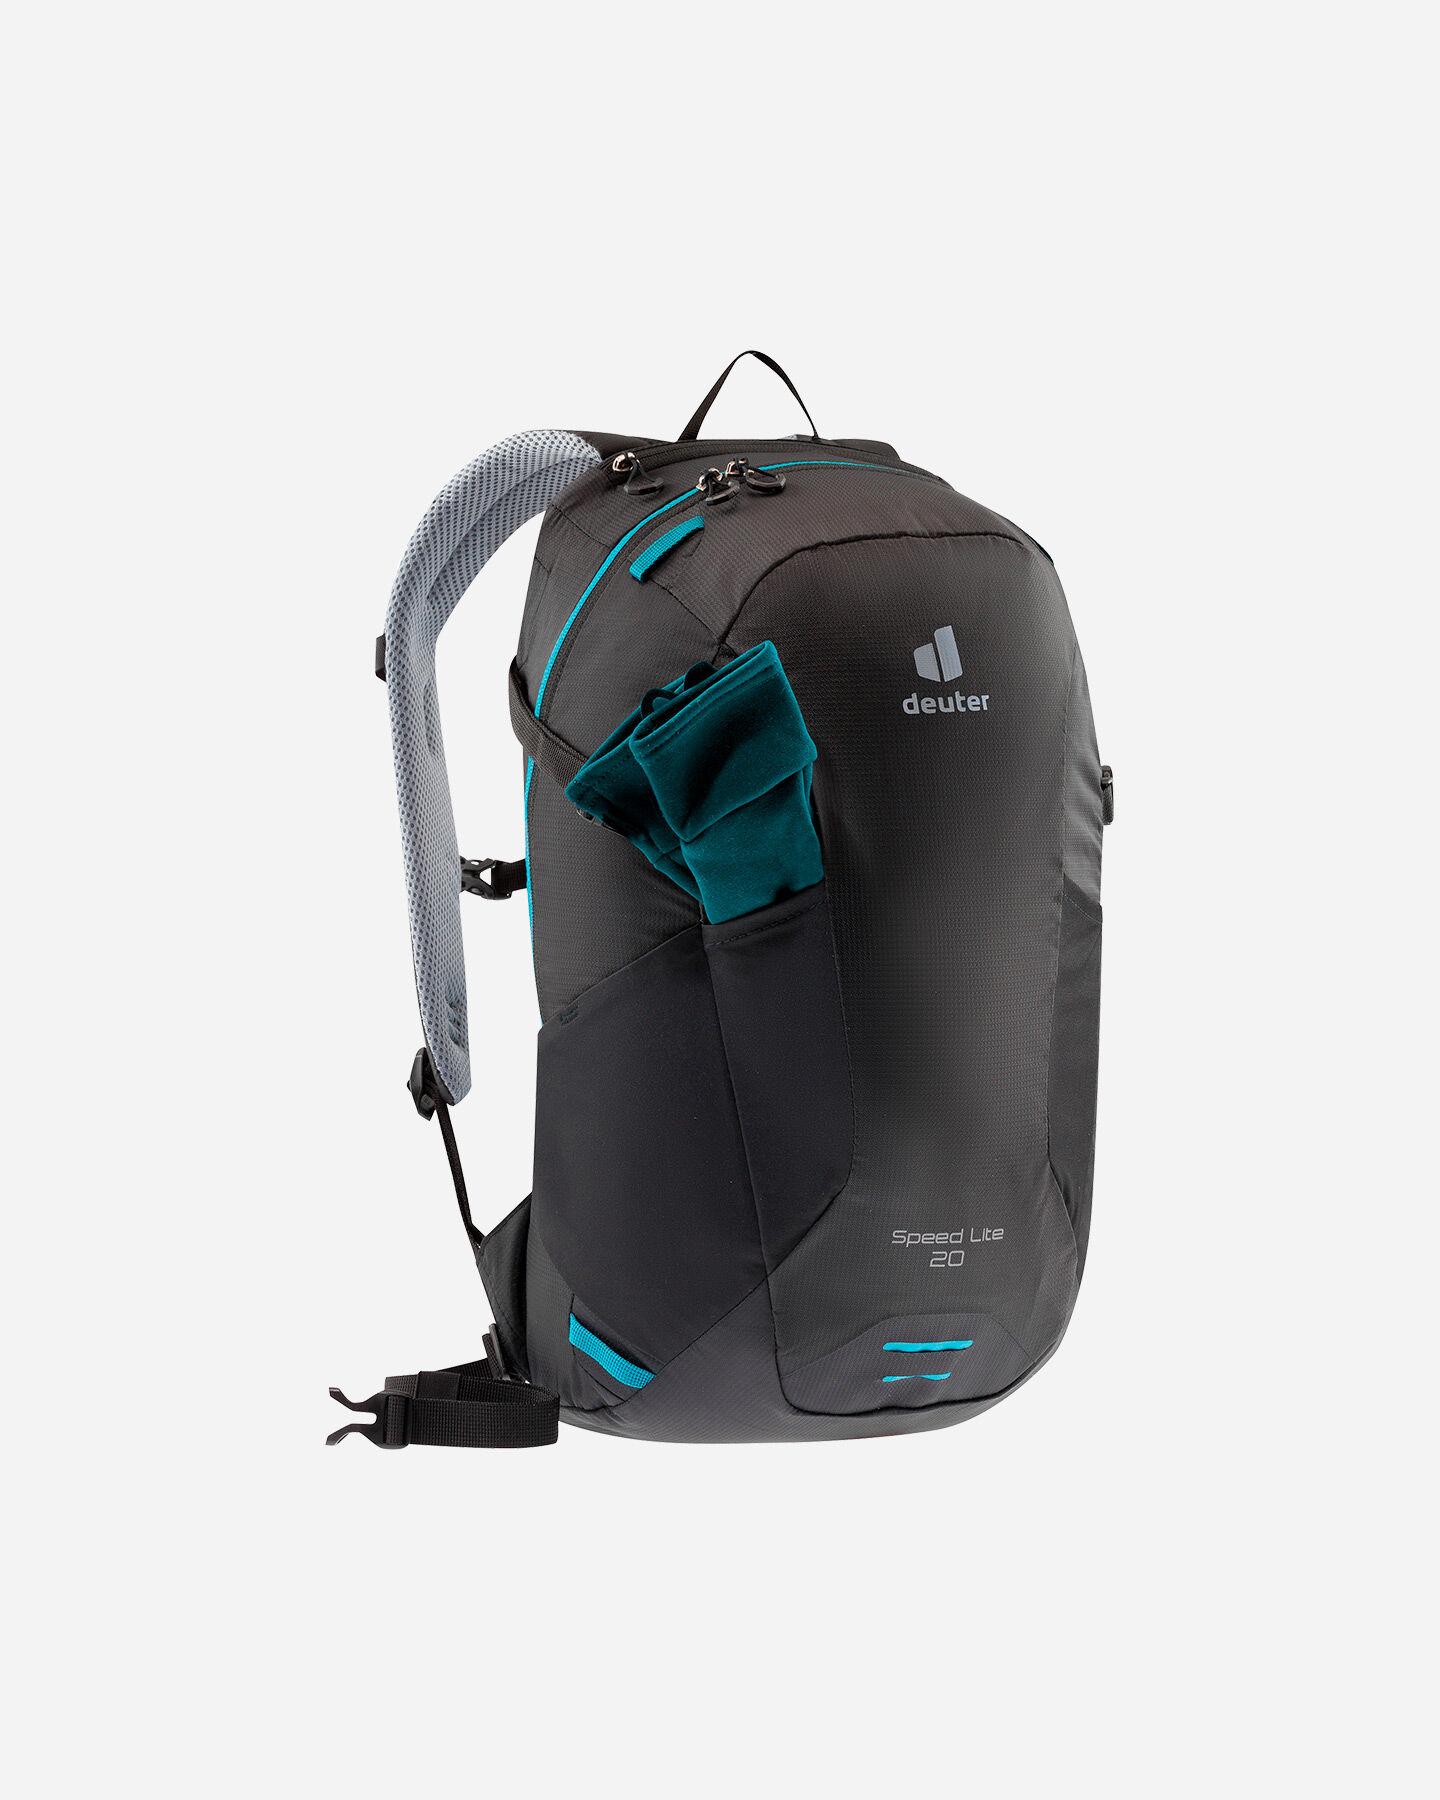 Zaino alpinismo DEUTER SPEEDLITE 20 S4090222|7000|UNI scatto 0